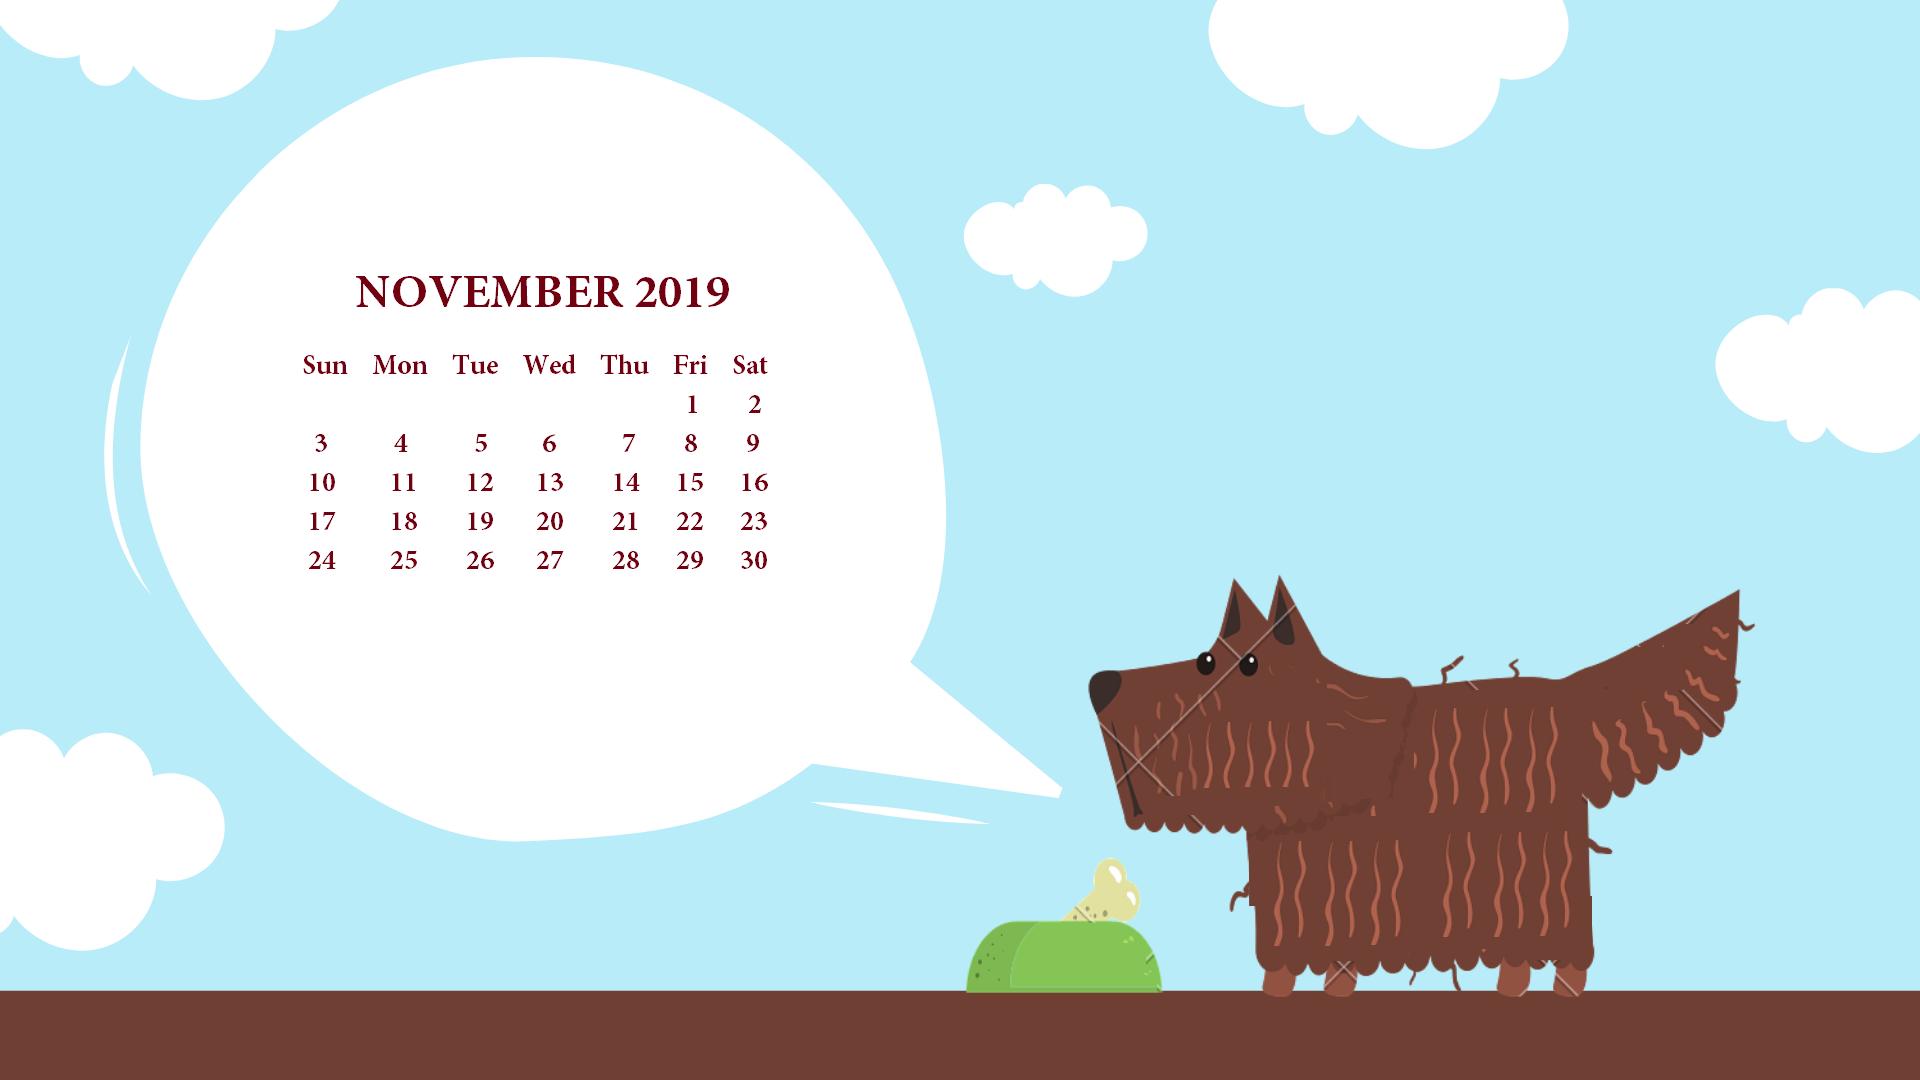 November 2019 Desktop Wallpaper With Calendar